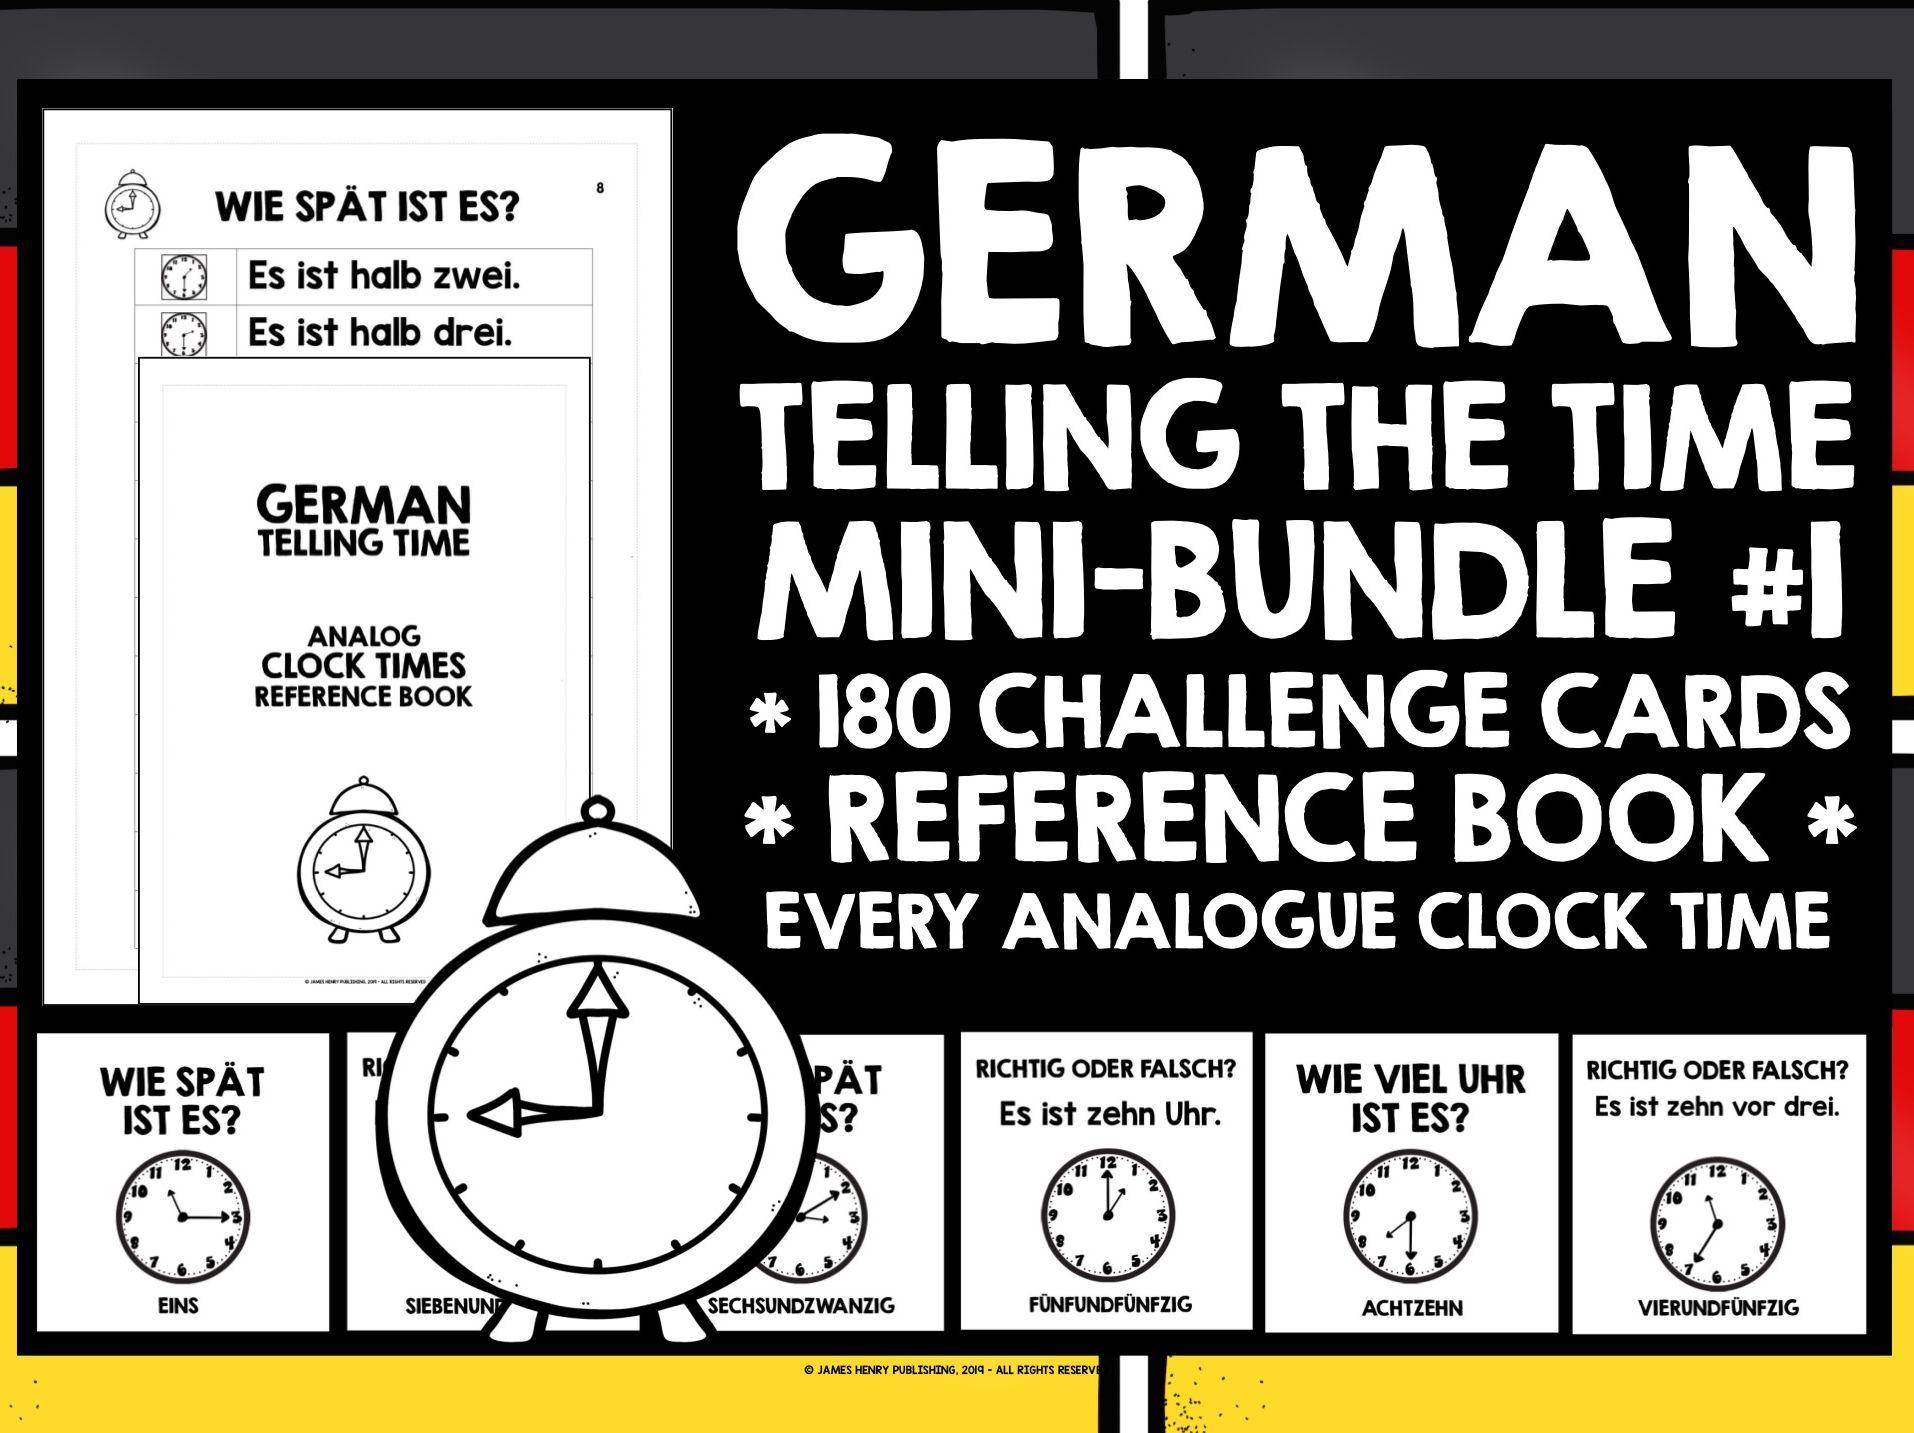 GERMAN TELLING TIME MINI-BUNDLE #1